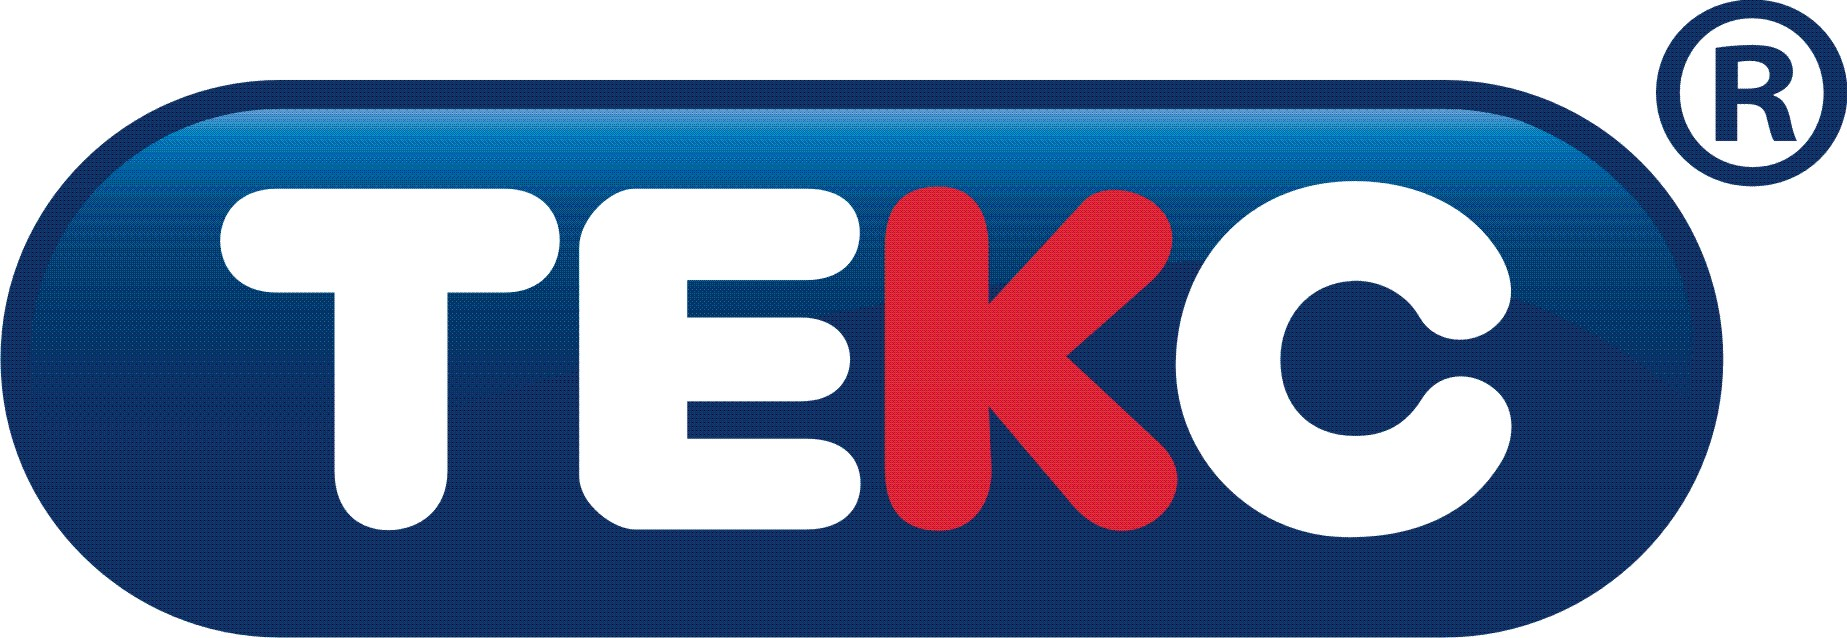 Логотип Текс